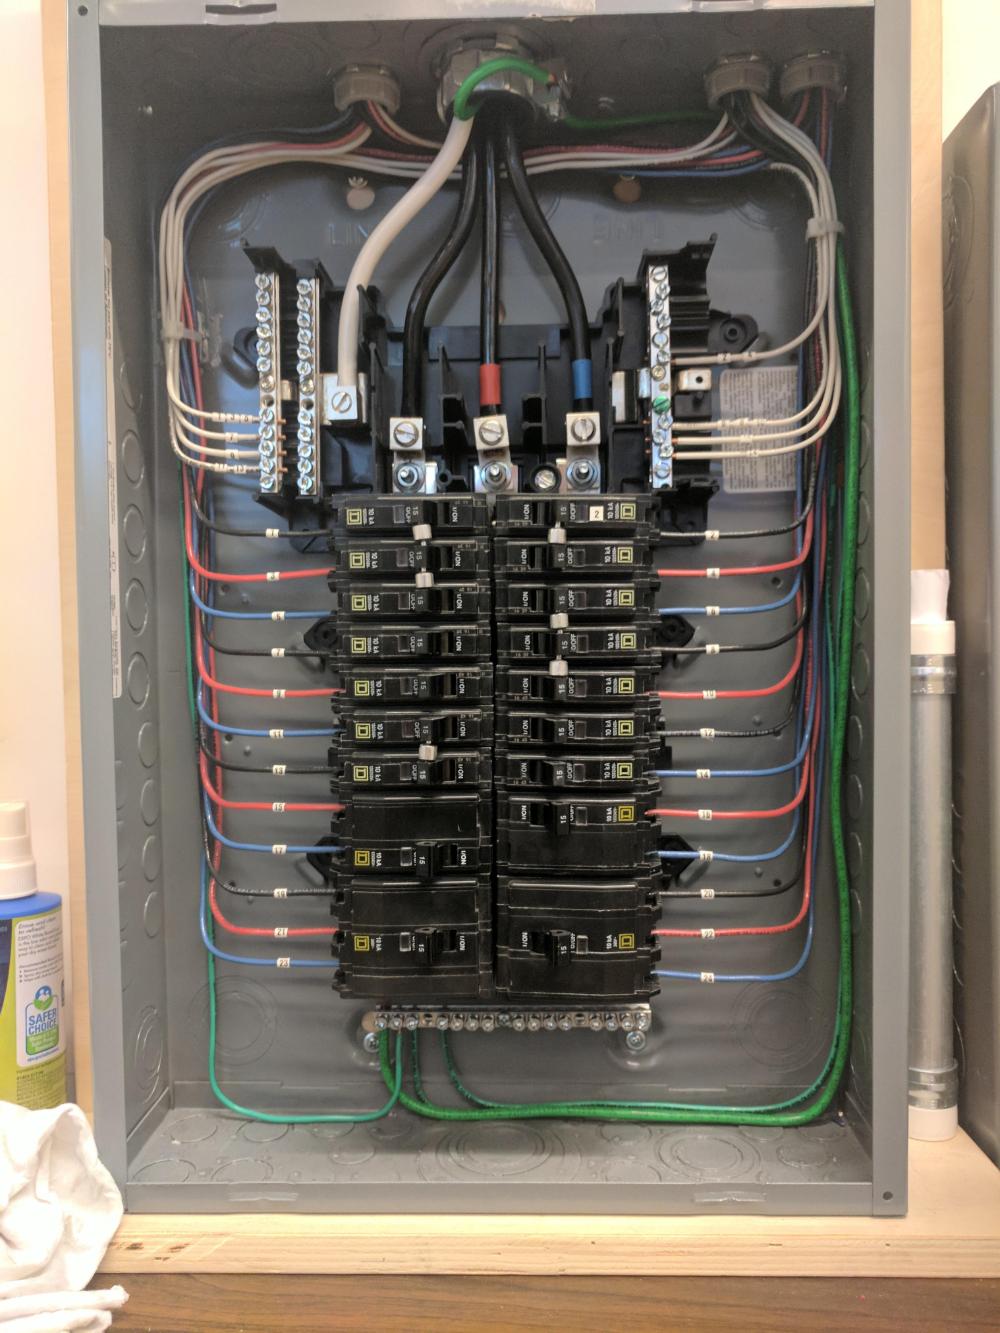 Residential Electrical Panel Wiring Diagrams 3 Phase Electrical Panel Diagram Breaker Box Diagram Template Desk Juttaeckenbach De En 2020 Electrica